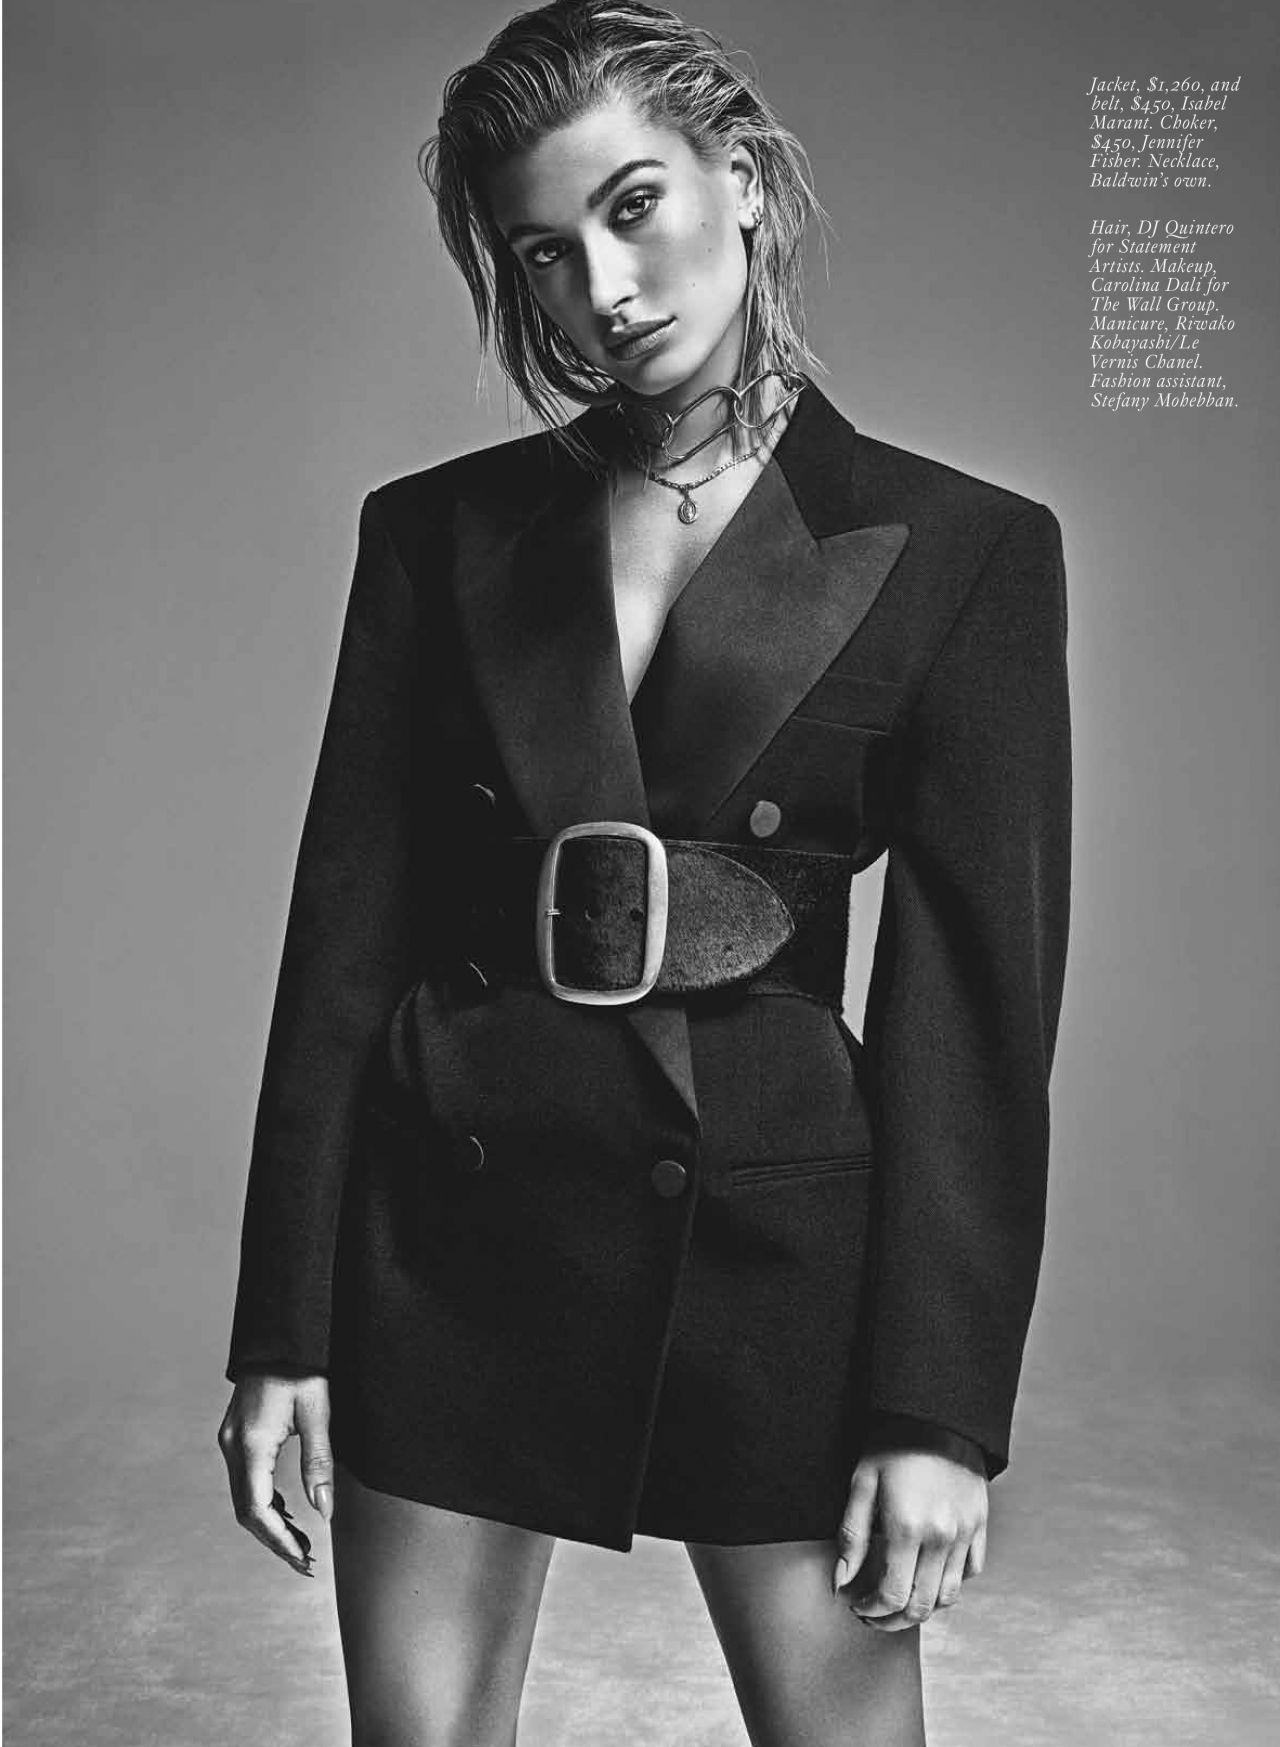 Hailey baldwin fashion magazine october 2019 issue naked (15 pics)